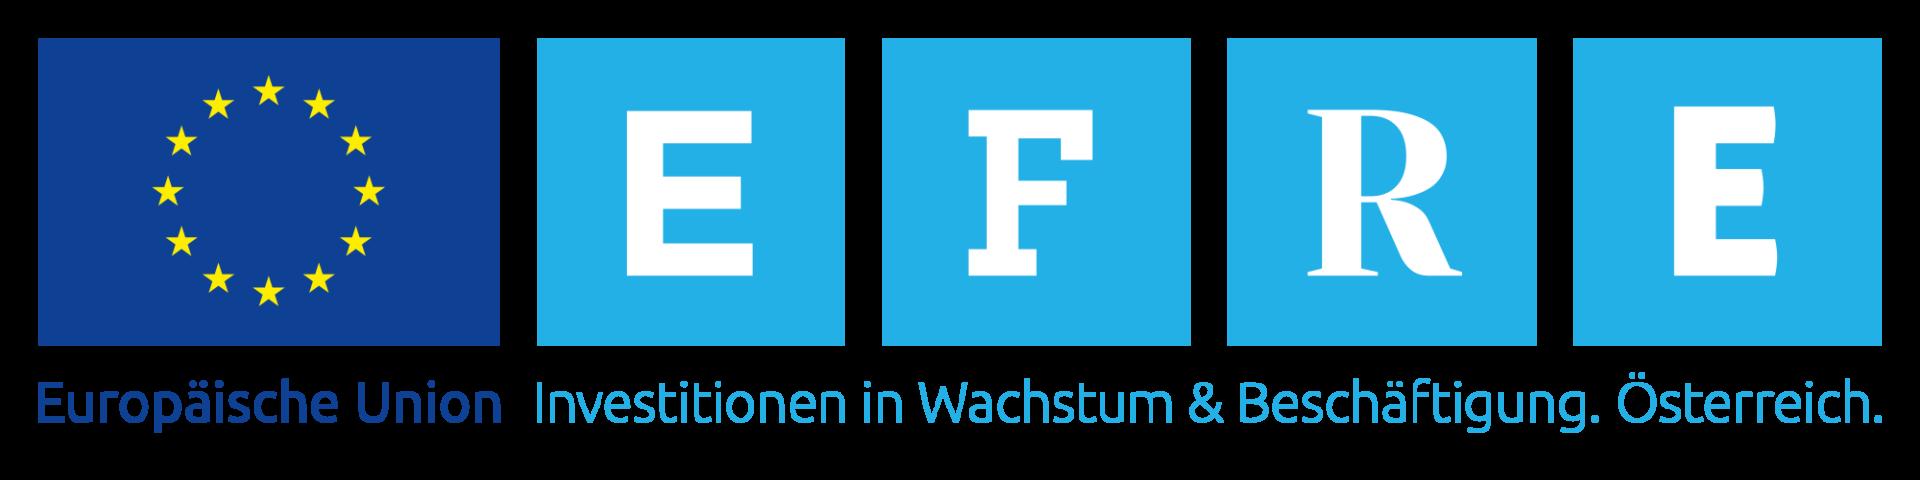 ERFE Logo